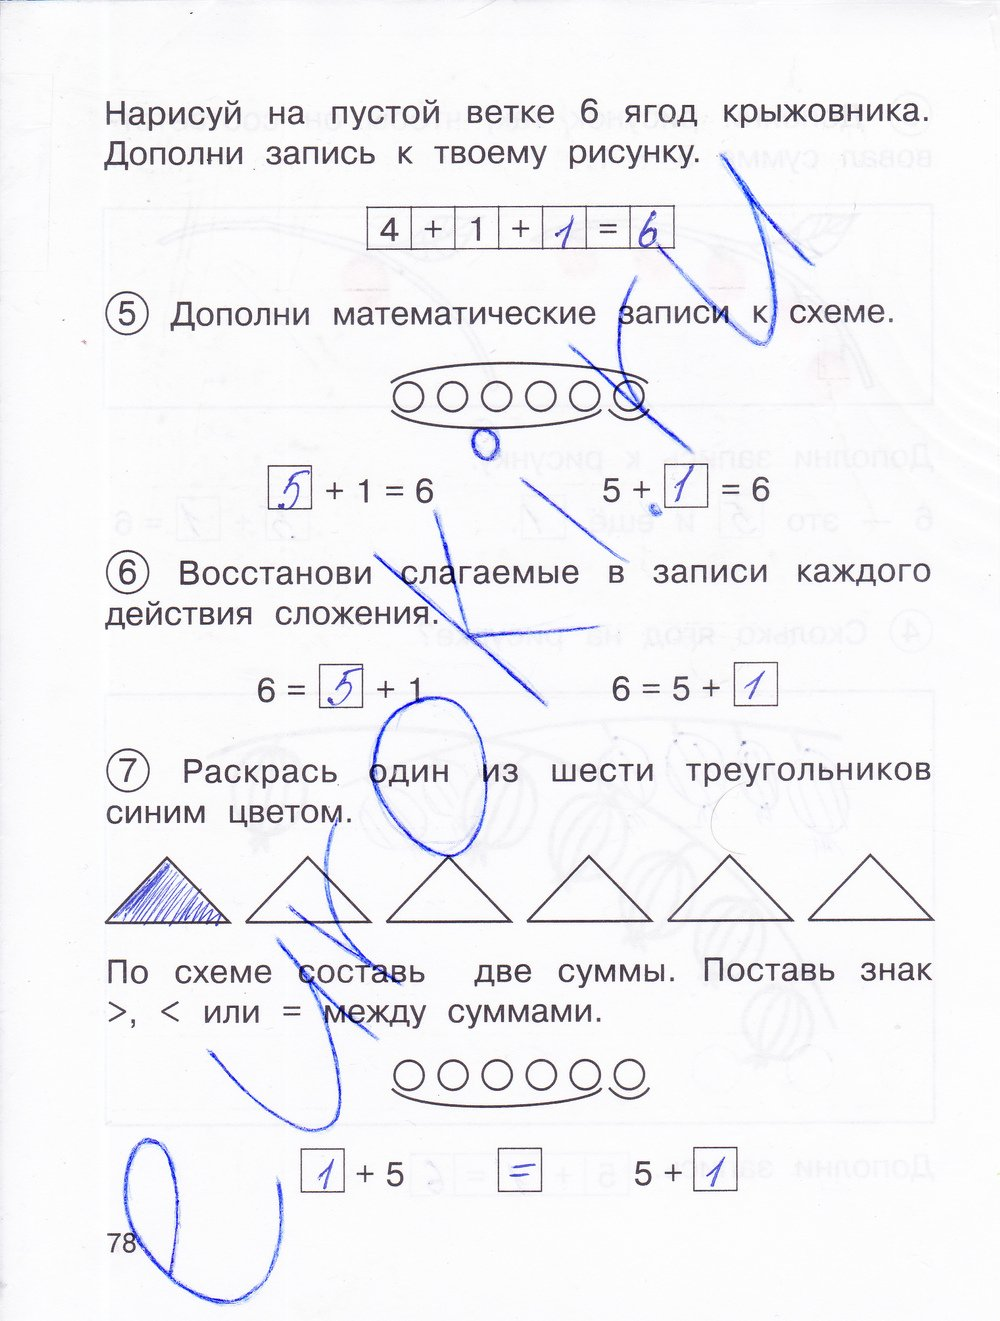 гдз 2 класс математика захарова юдина рабочая тетрадь 1